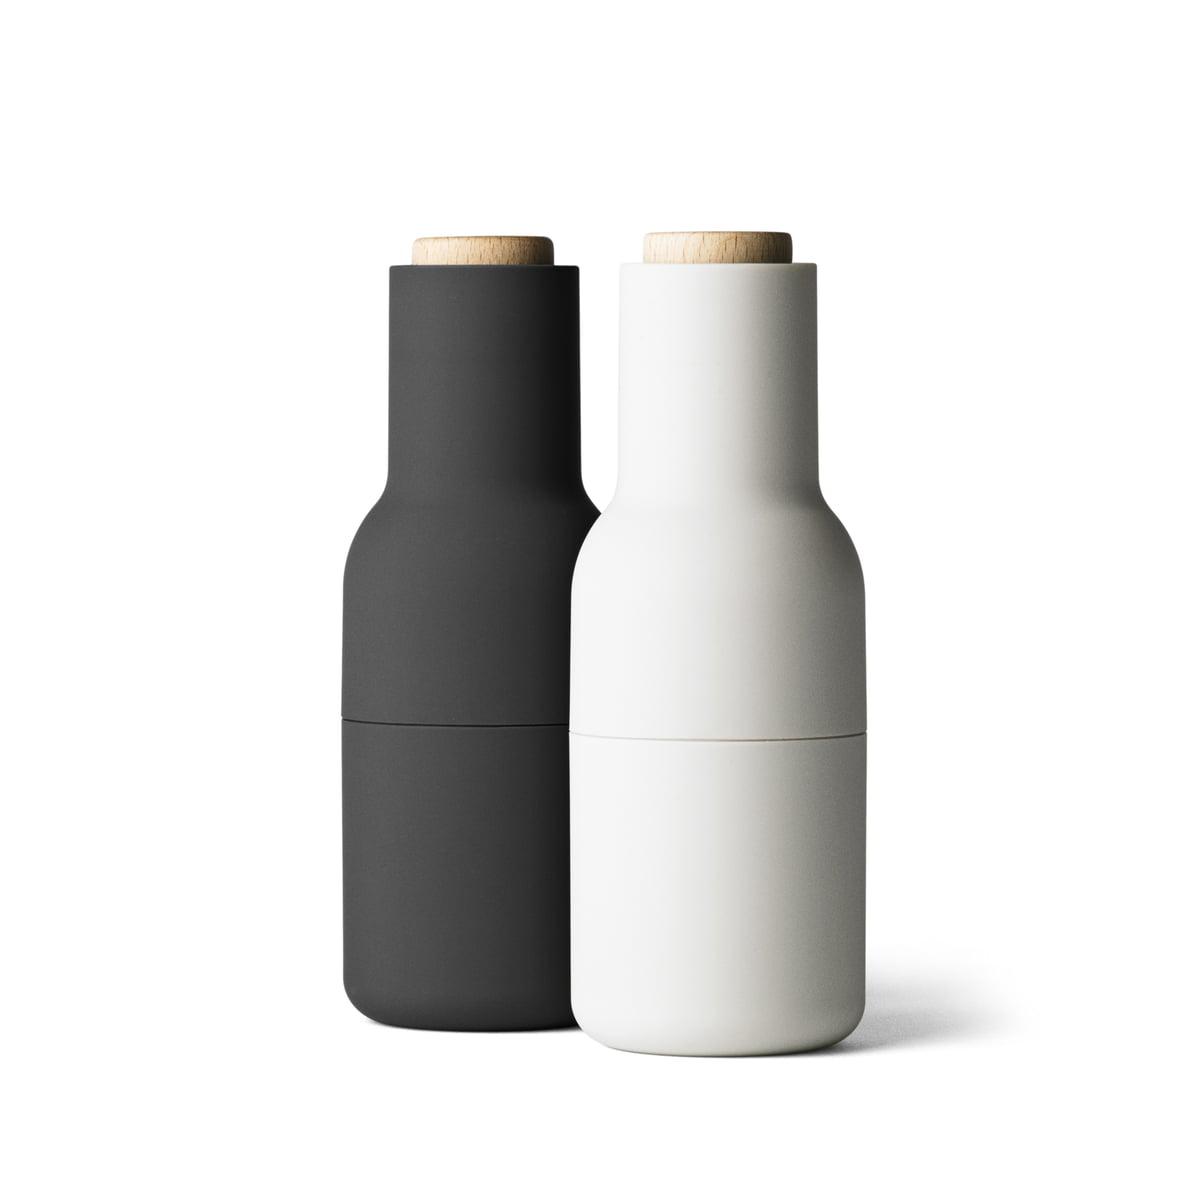 menu bottle salz und pfefferm hlen set ash carbon. Black Bedroom Furniture Sets. Home Design Ideas